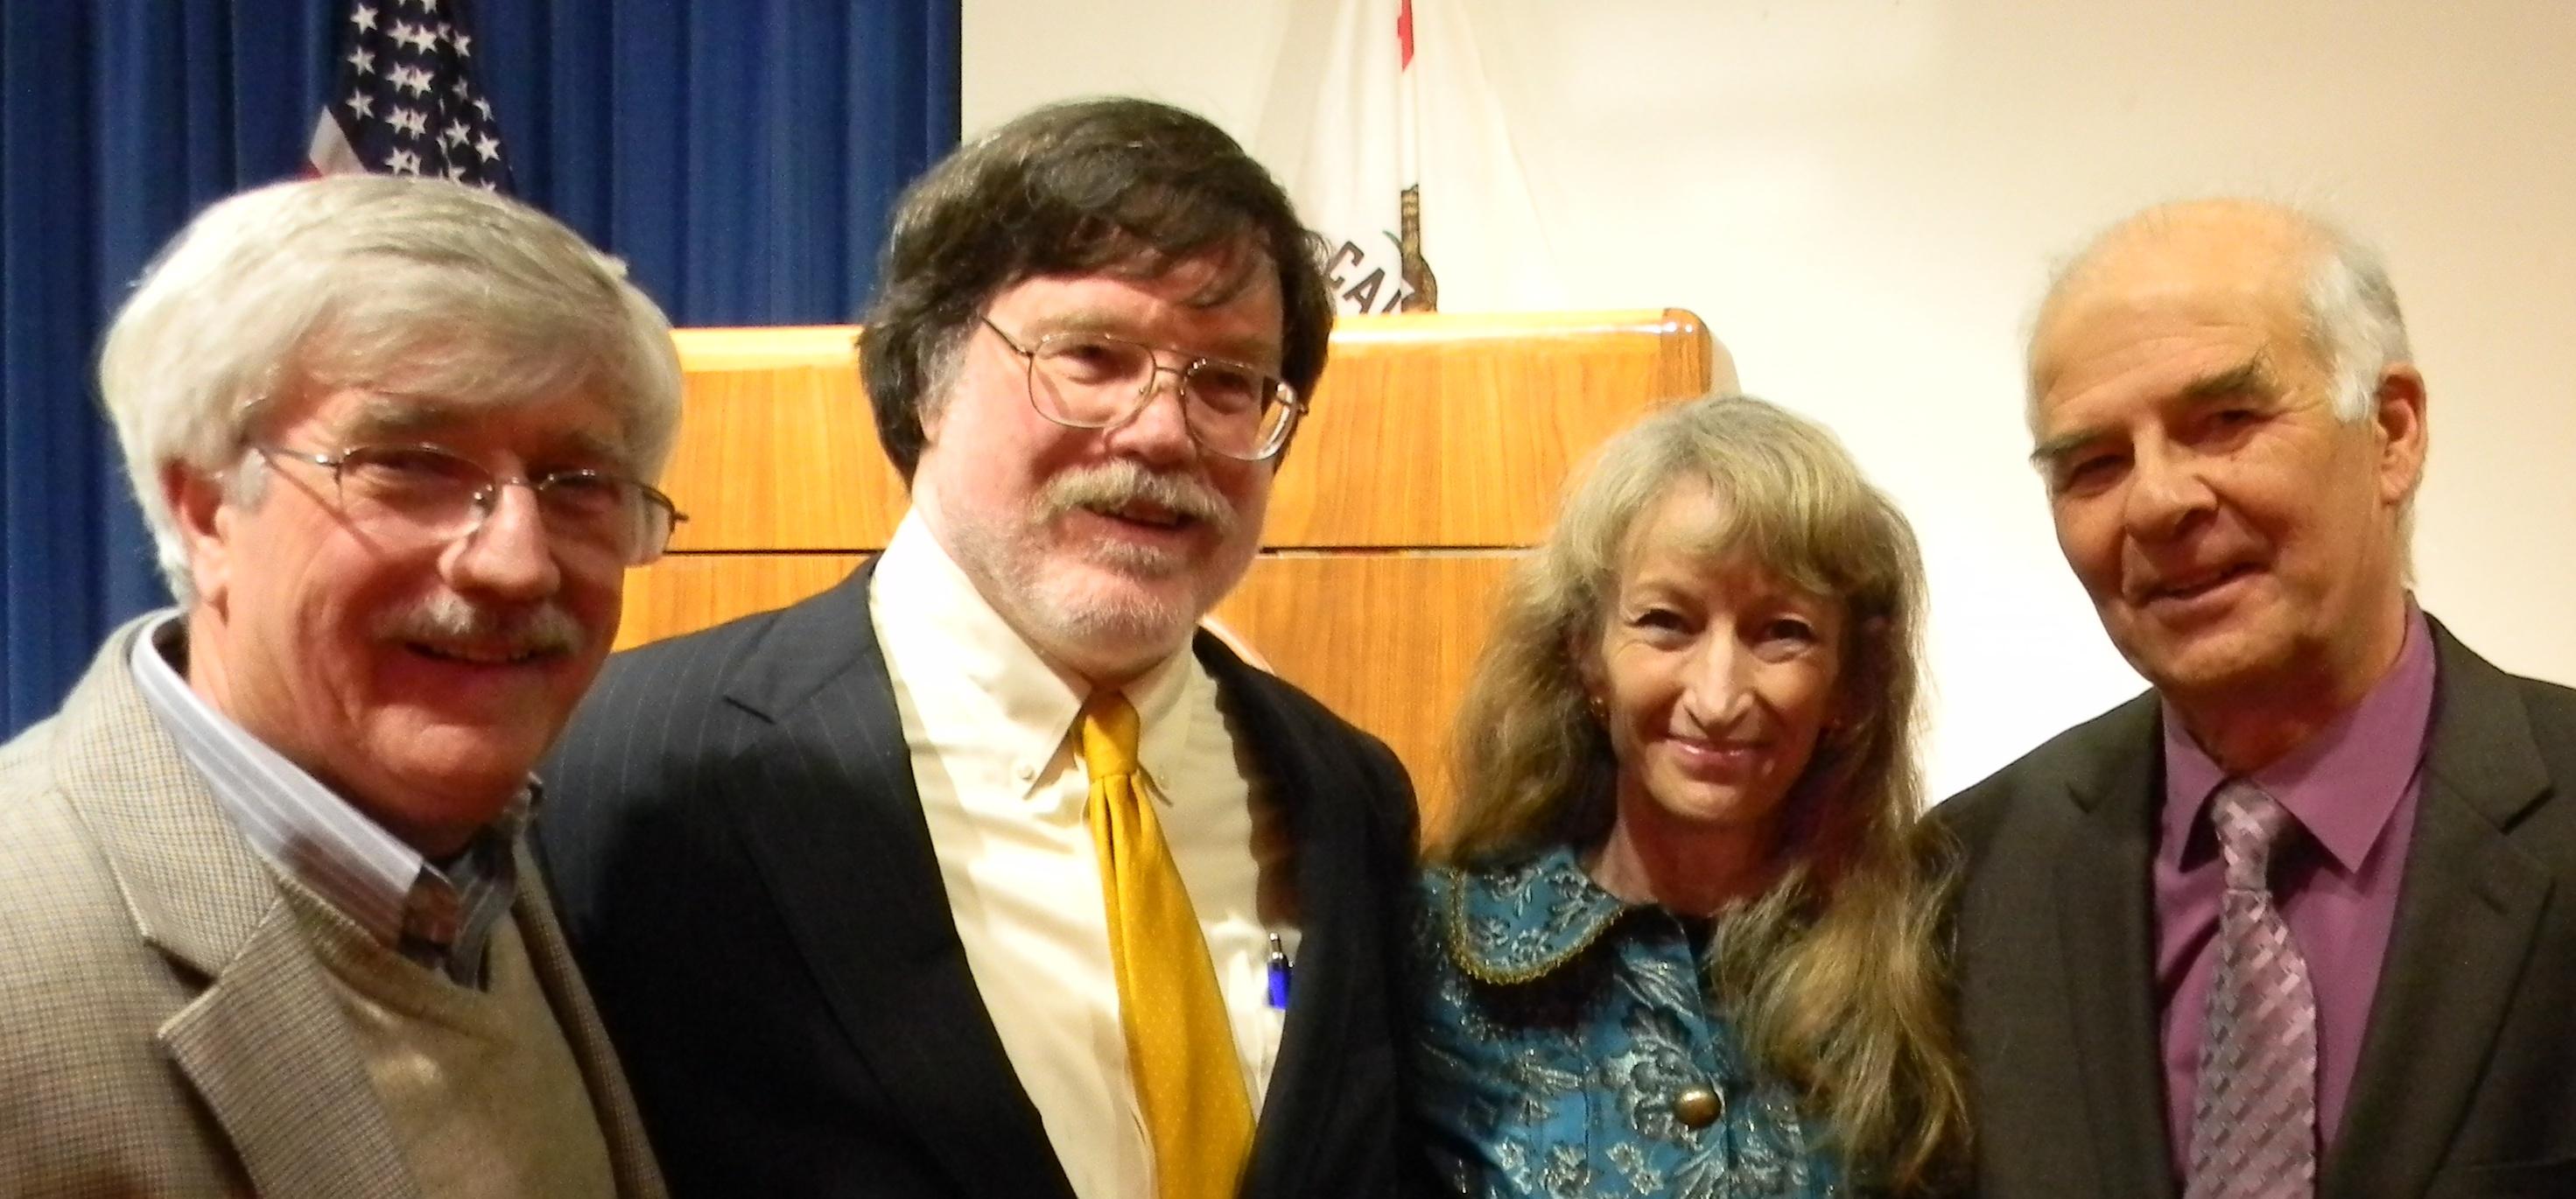 VRTF members with Debra Bowen